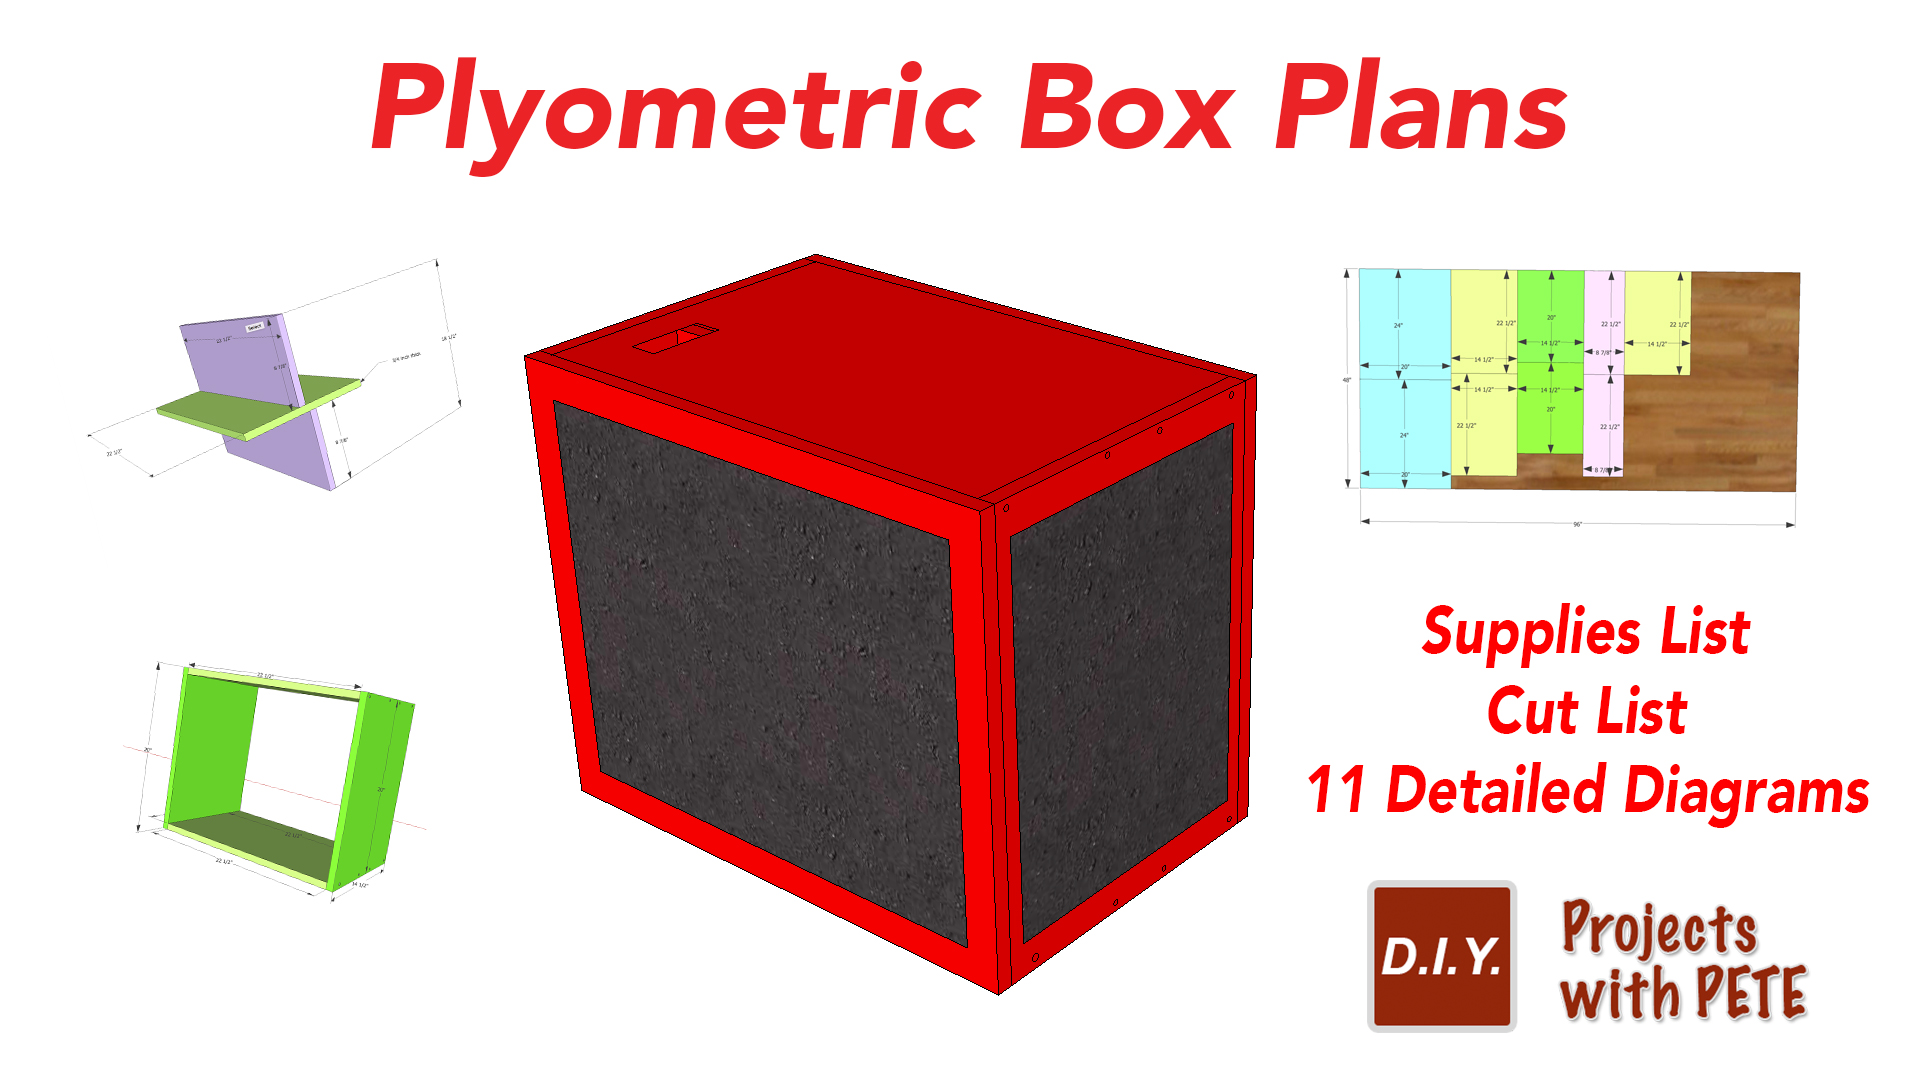 How To Make A Plyometric Box With Free Plyometric Box Plans